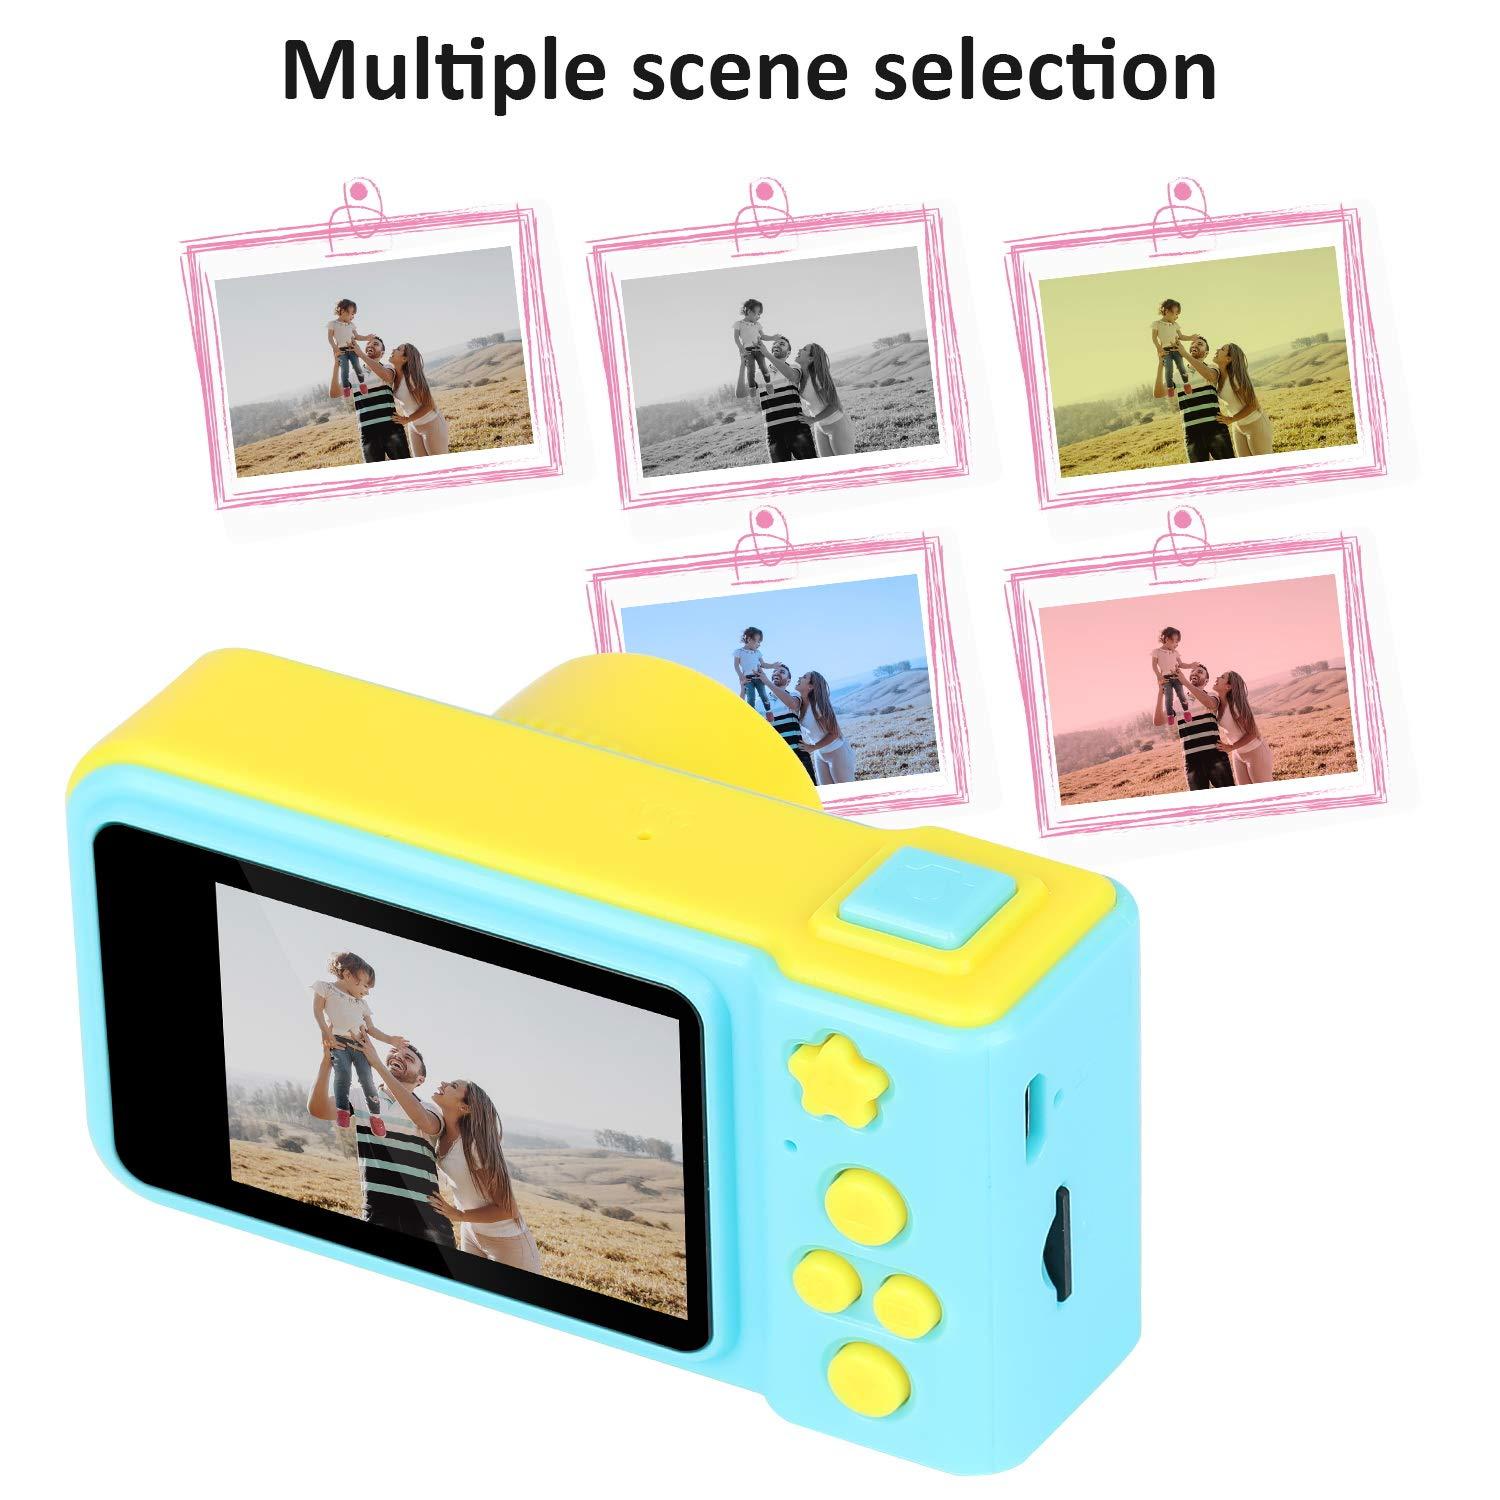 LOXROZ Kids Digital Camera Mini 2 Inch Screen Children's Digital Camera with Card Reader & 16G Micro SD Card (Blue) by LOXROZ (Image #4)